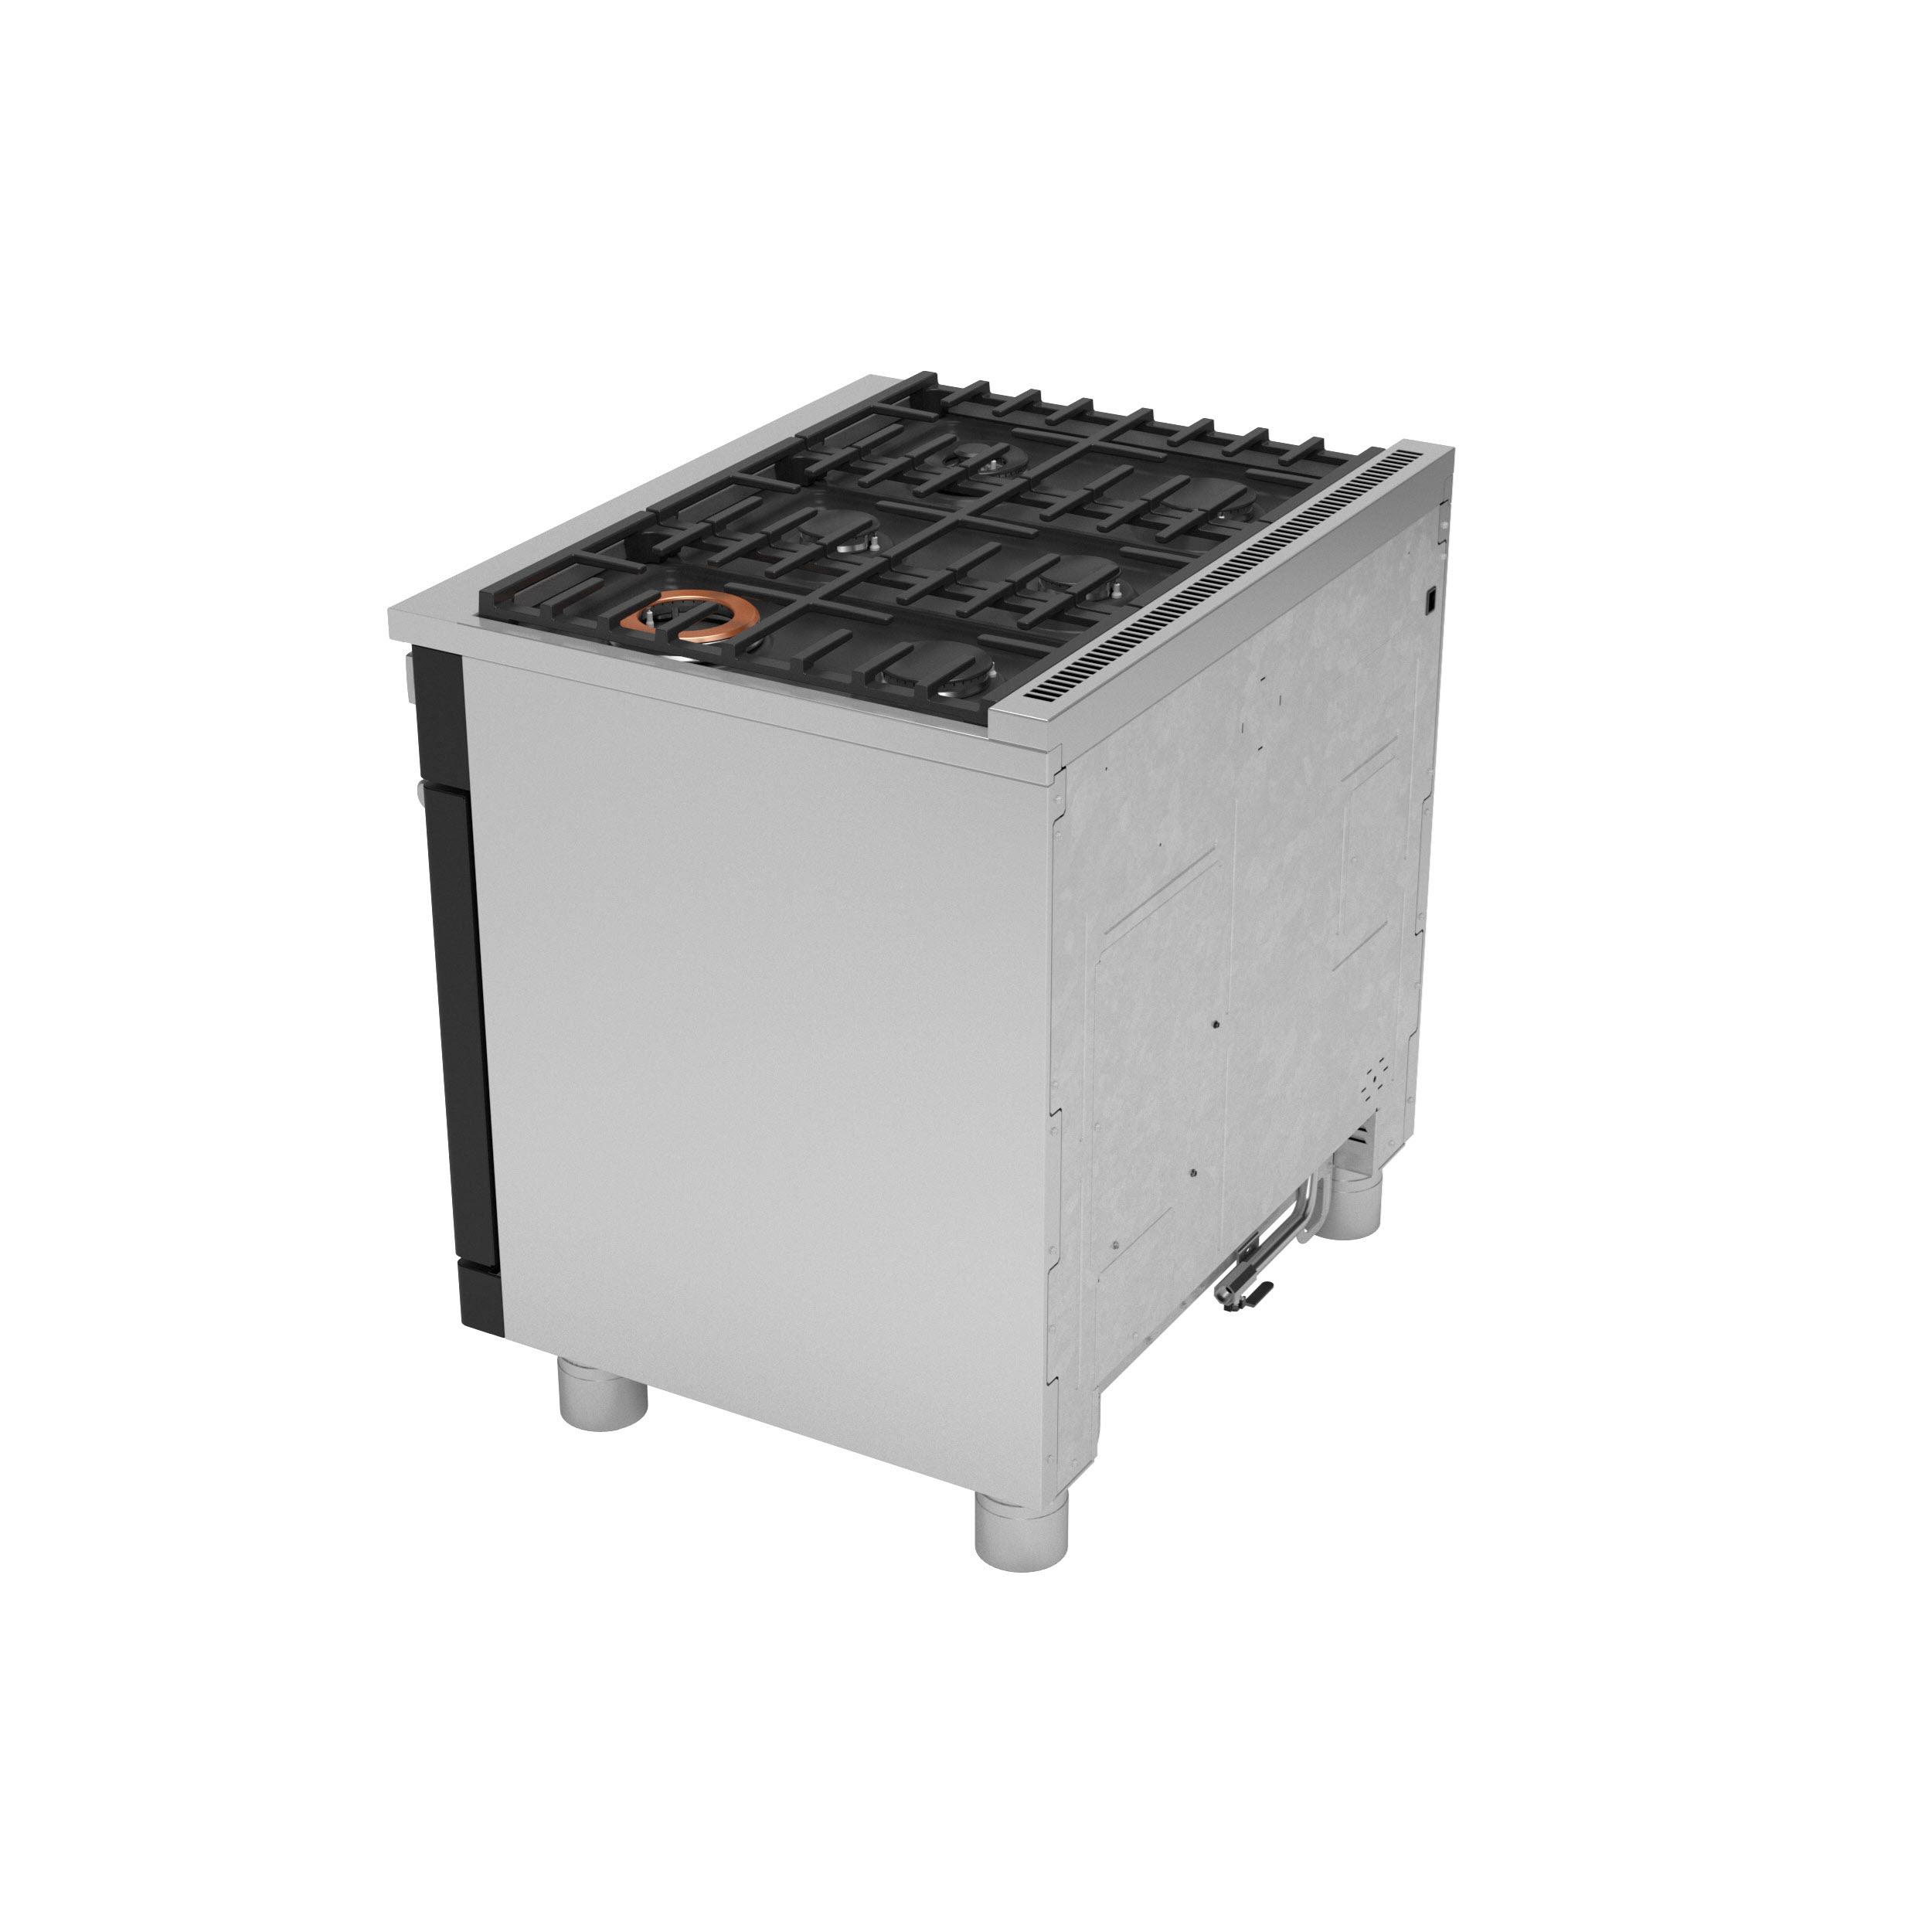 "Model: C2Y366P3TD1 | Cafe Café™ 36"" Smart Dual-Fuel Commercial-Style Range with 6 Burners (Natural Gas)"